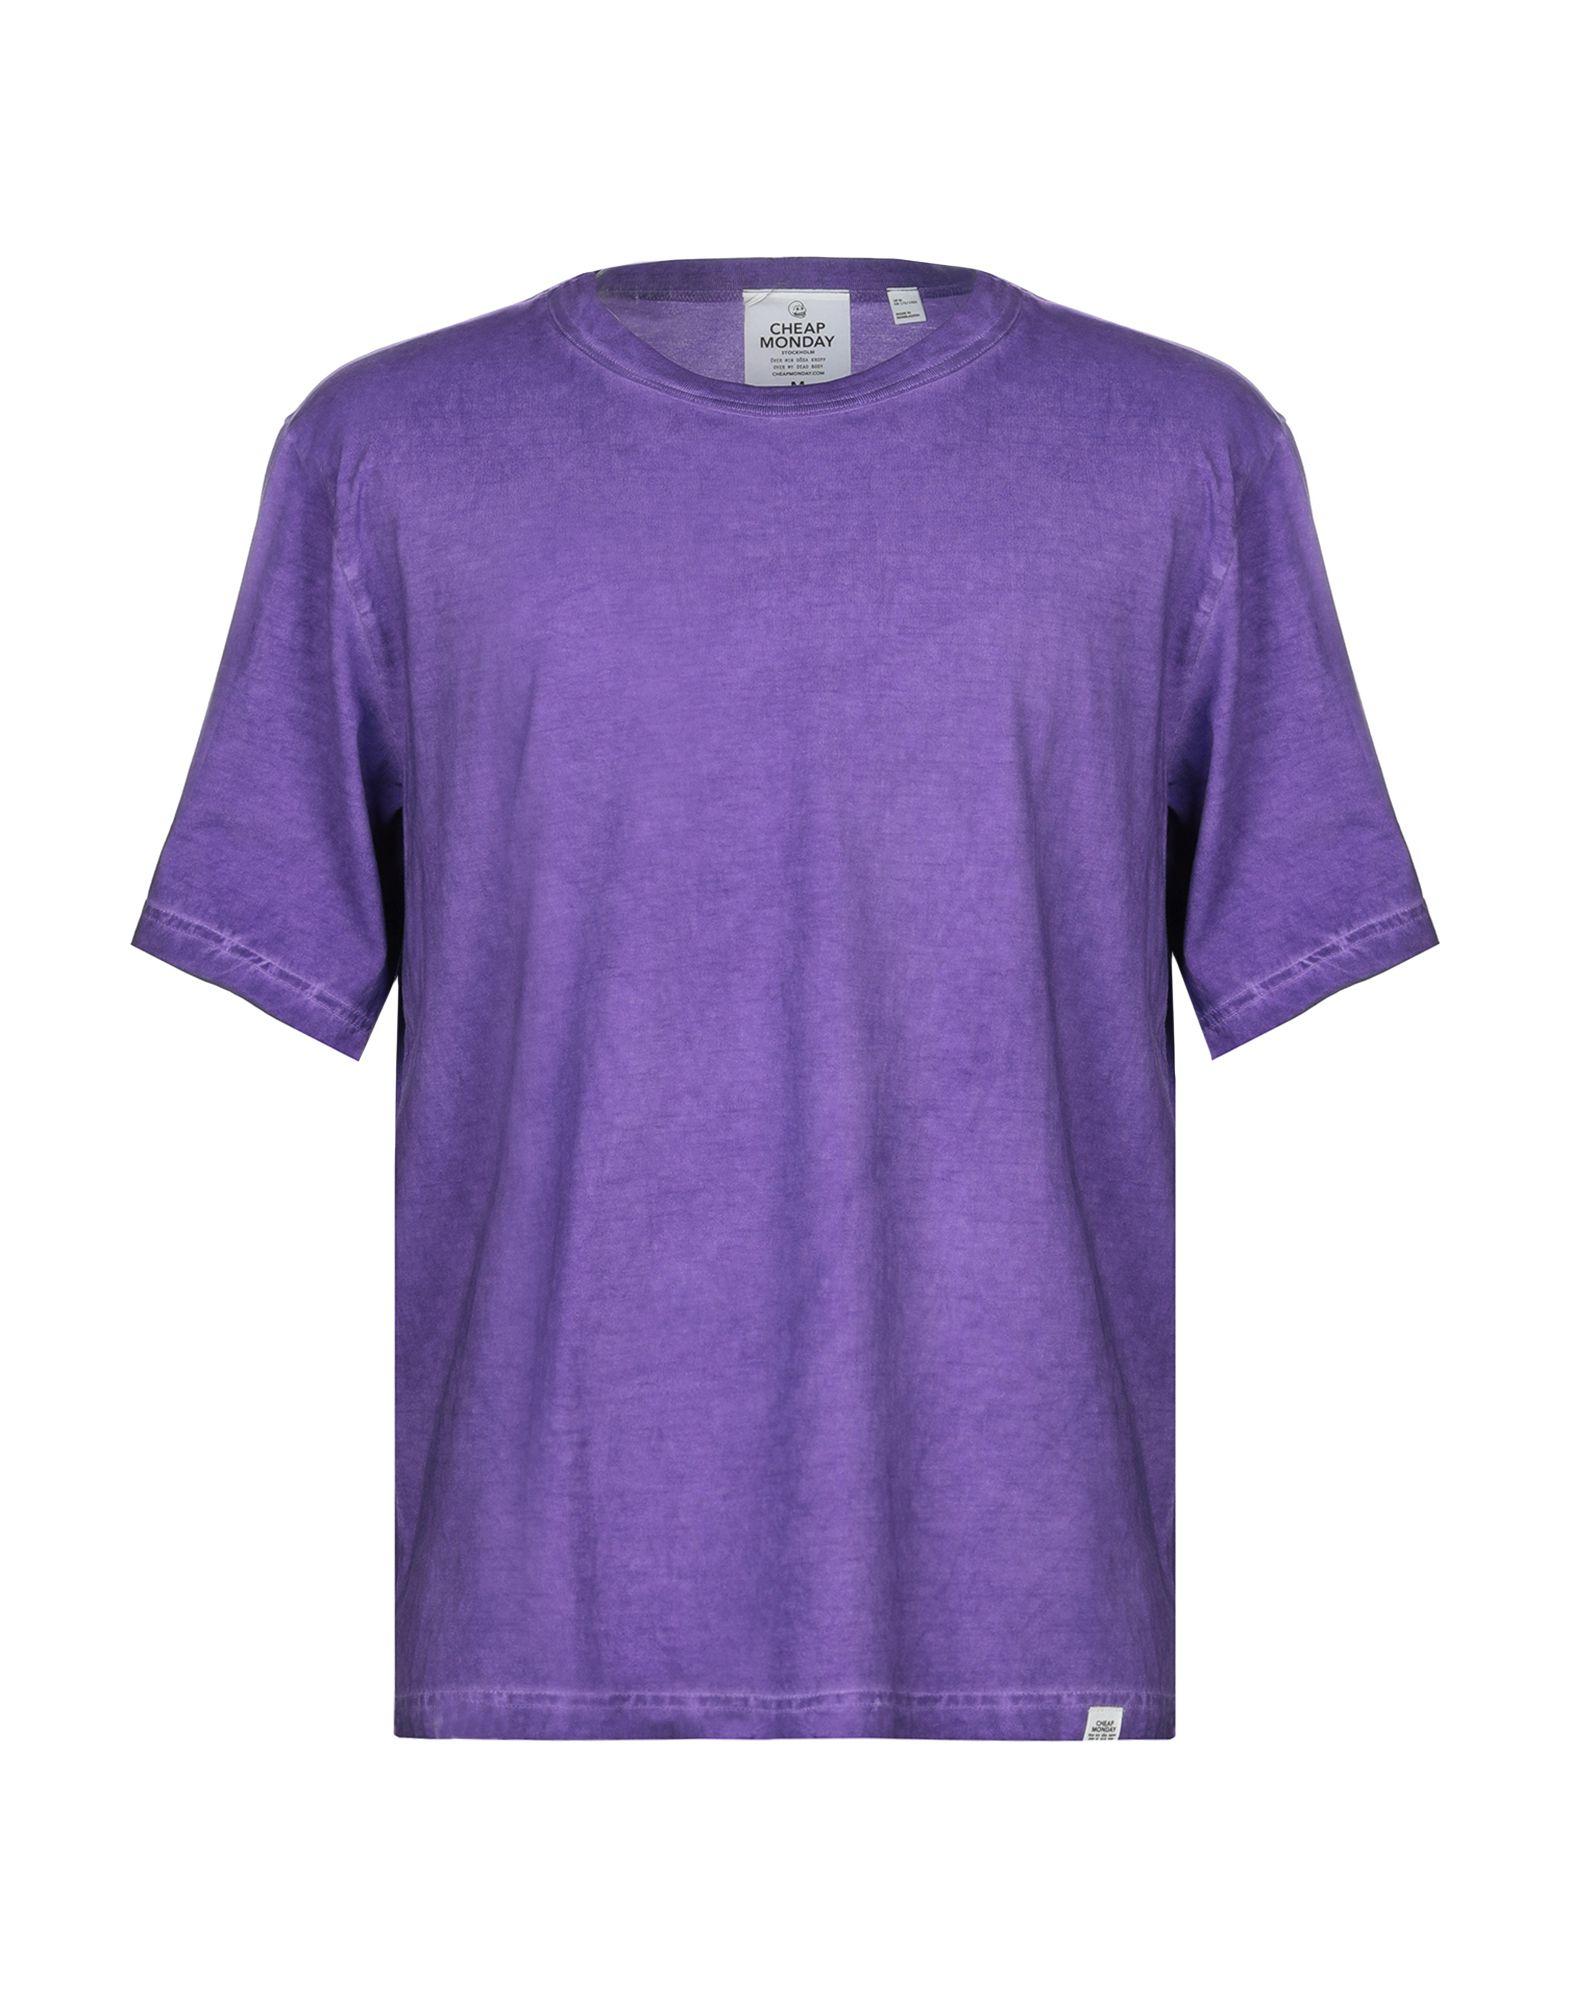 CHEAP MONDAY Футболка футболка женская cheap monday цвет белый 0515777 размер xs 40 page 9